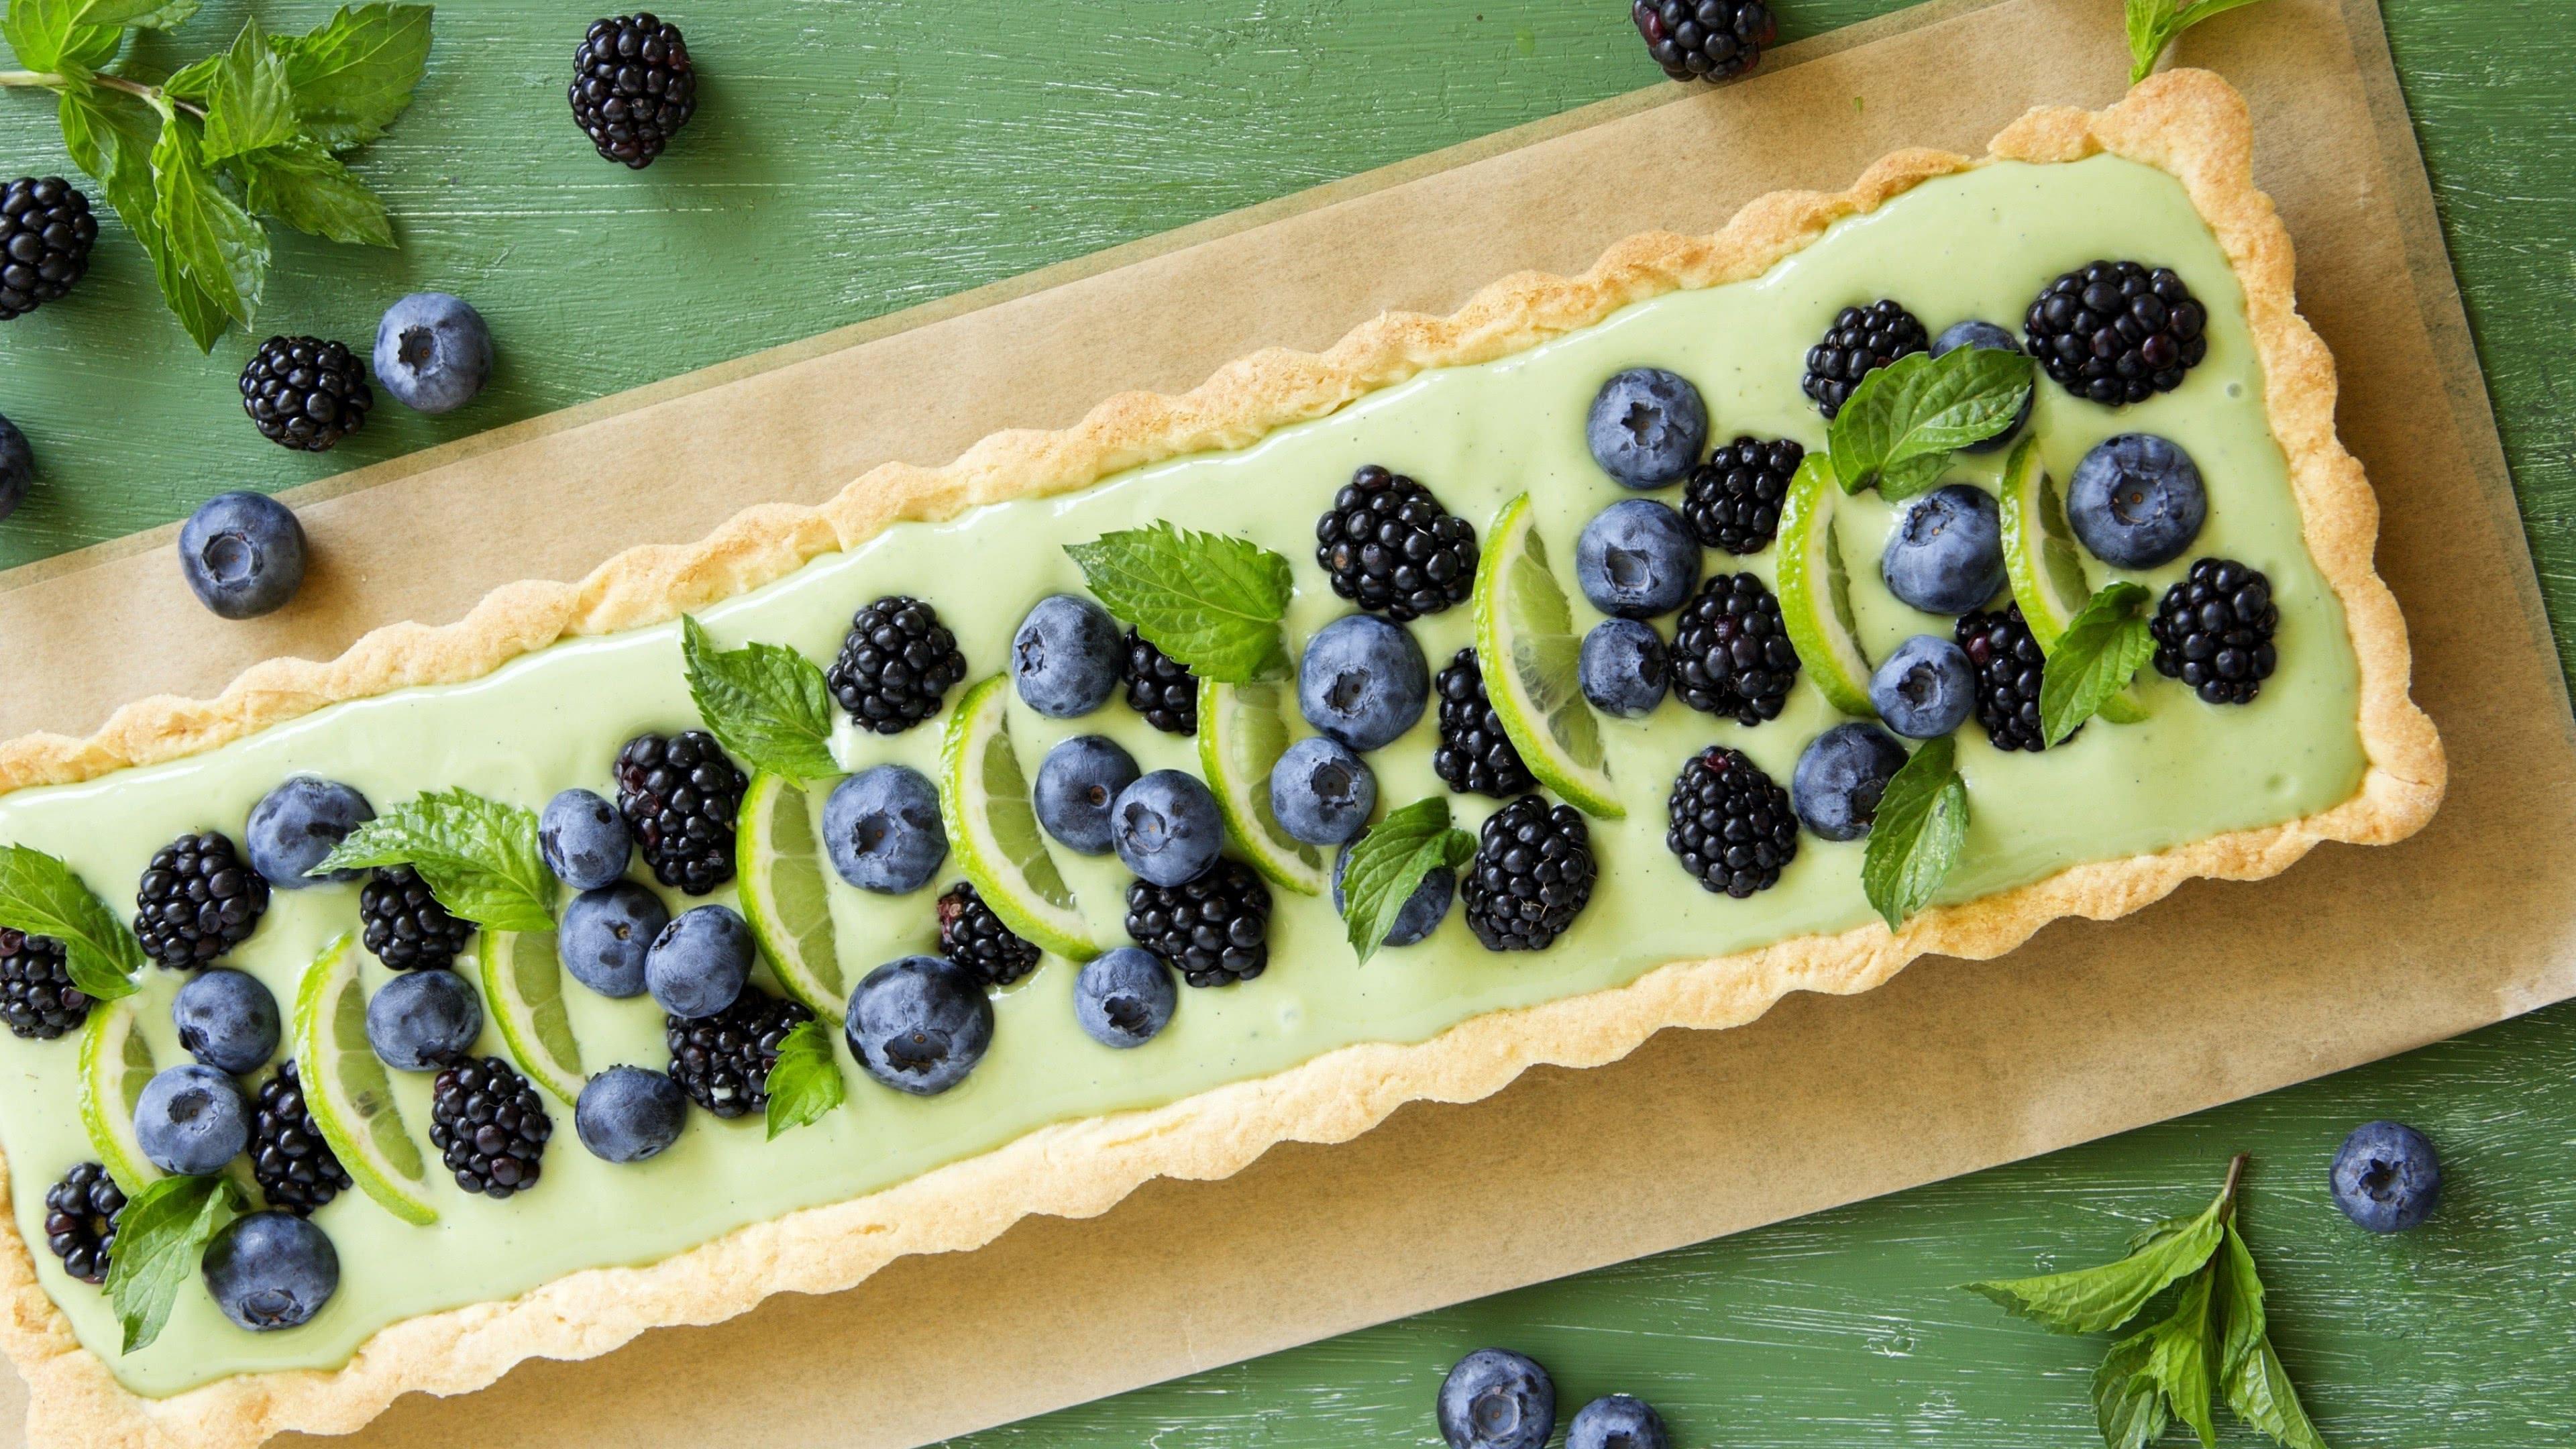 fruit pie blueberry blackberry mint uhd 4k wallpaper